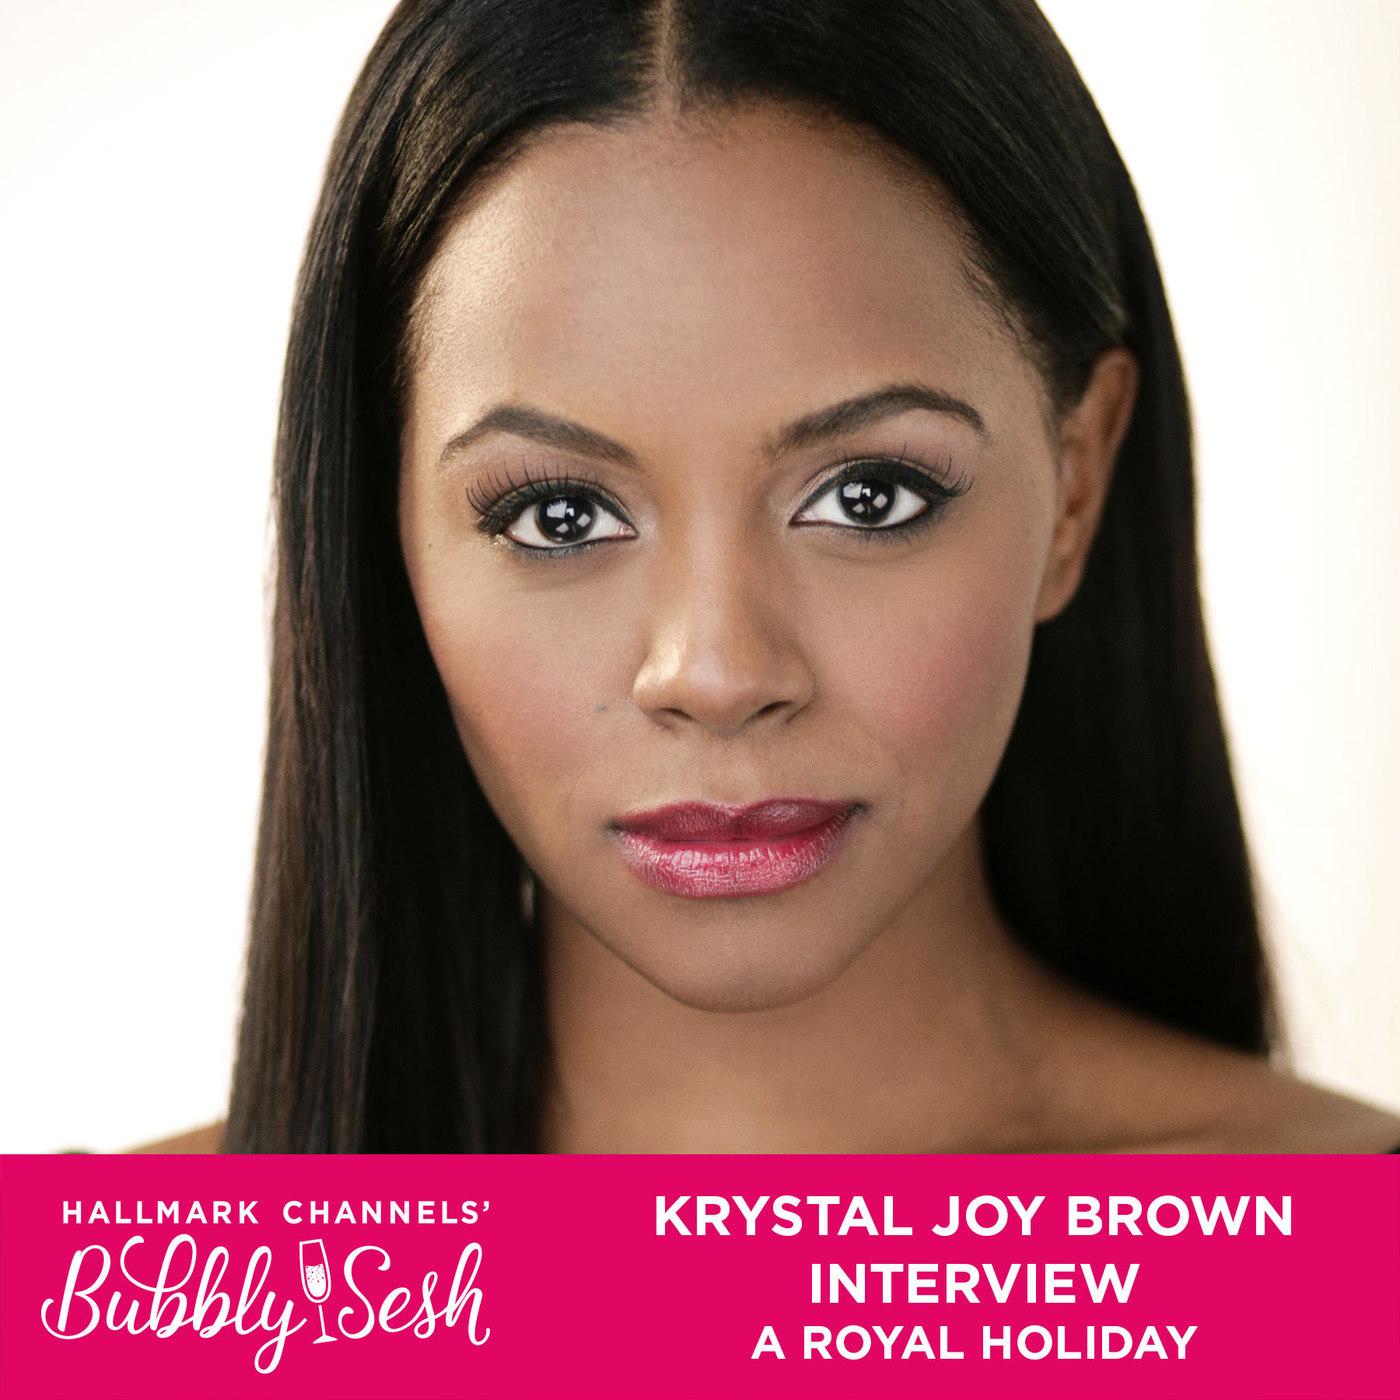 Krystal Joy Brown Interview, One Royal Holiday